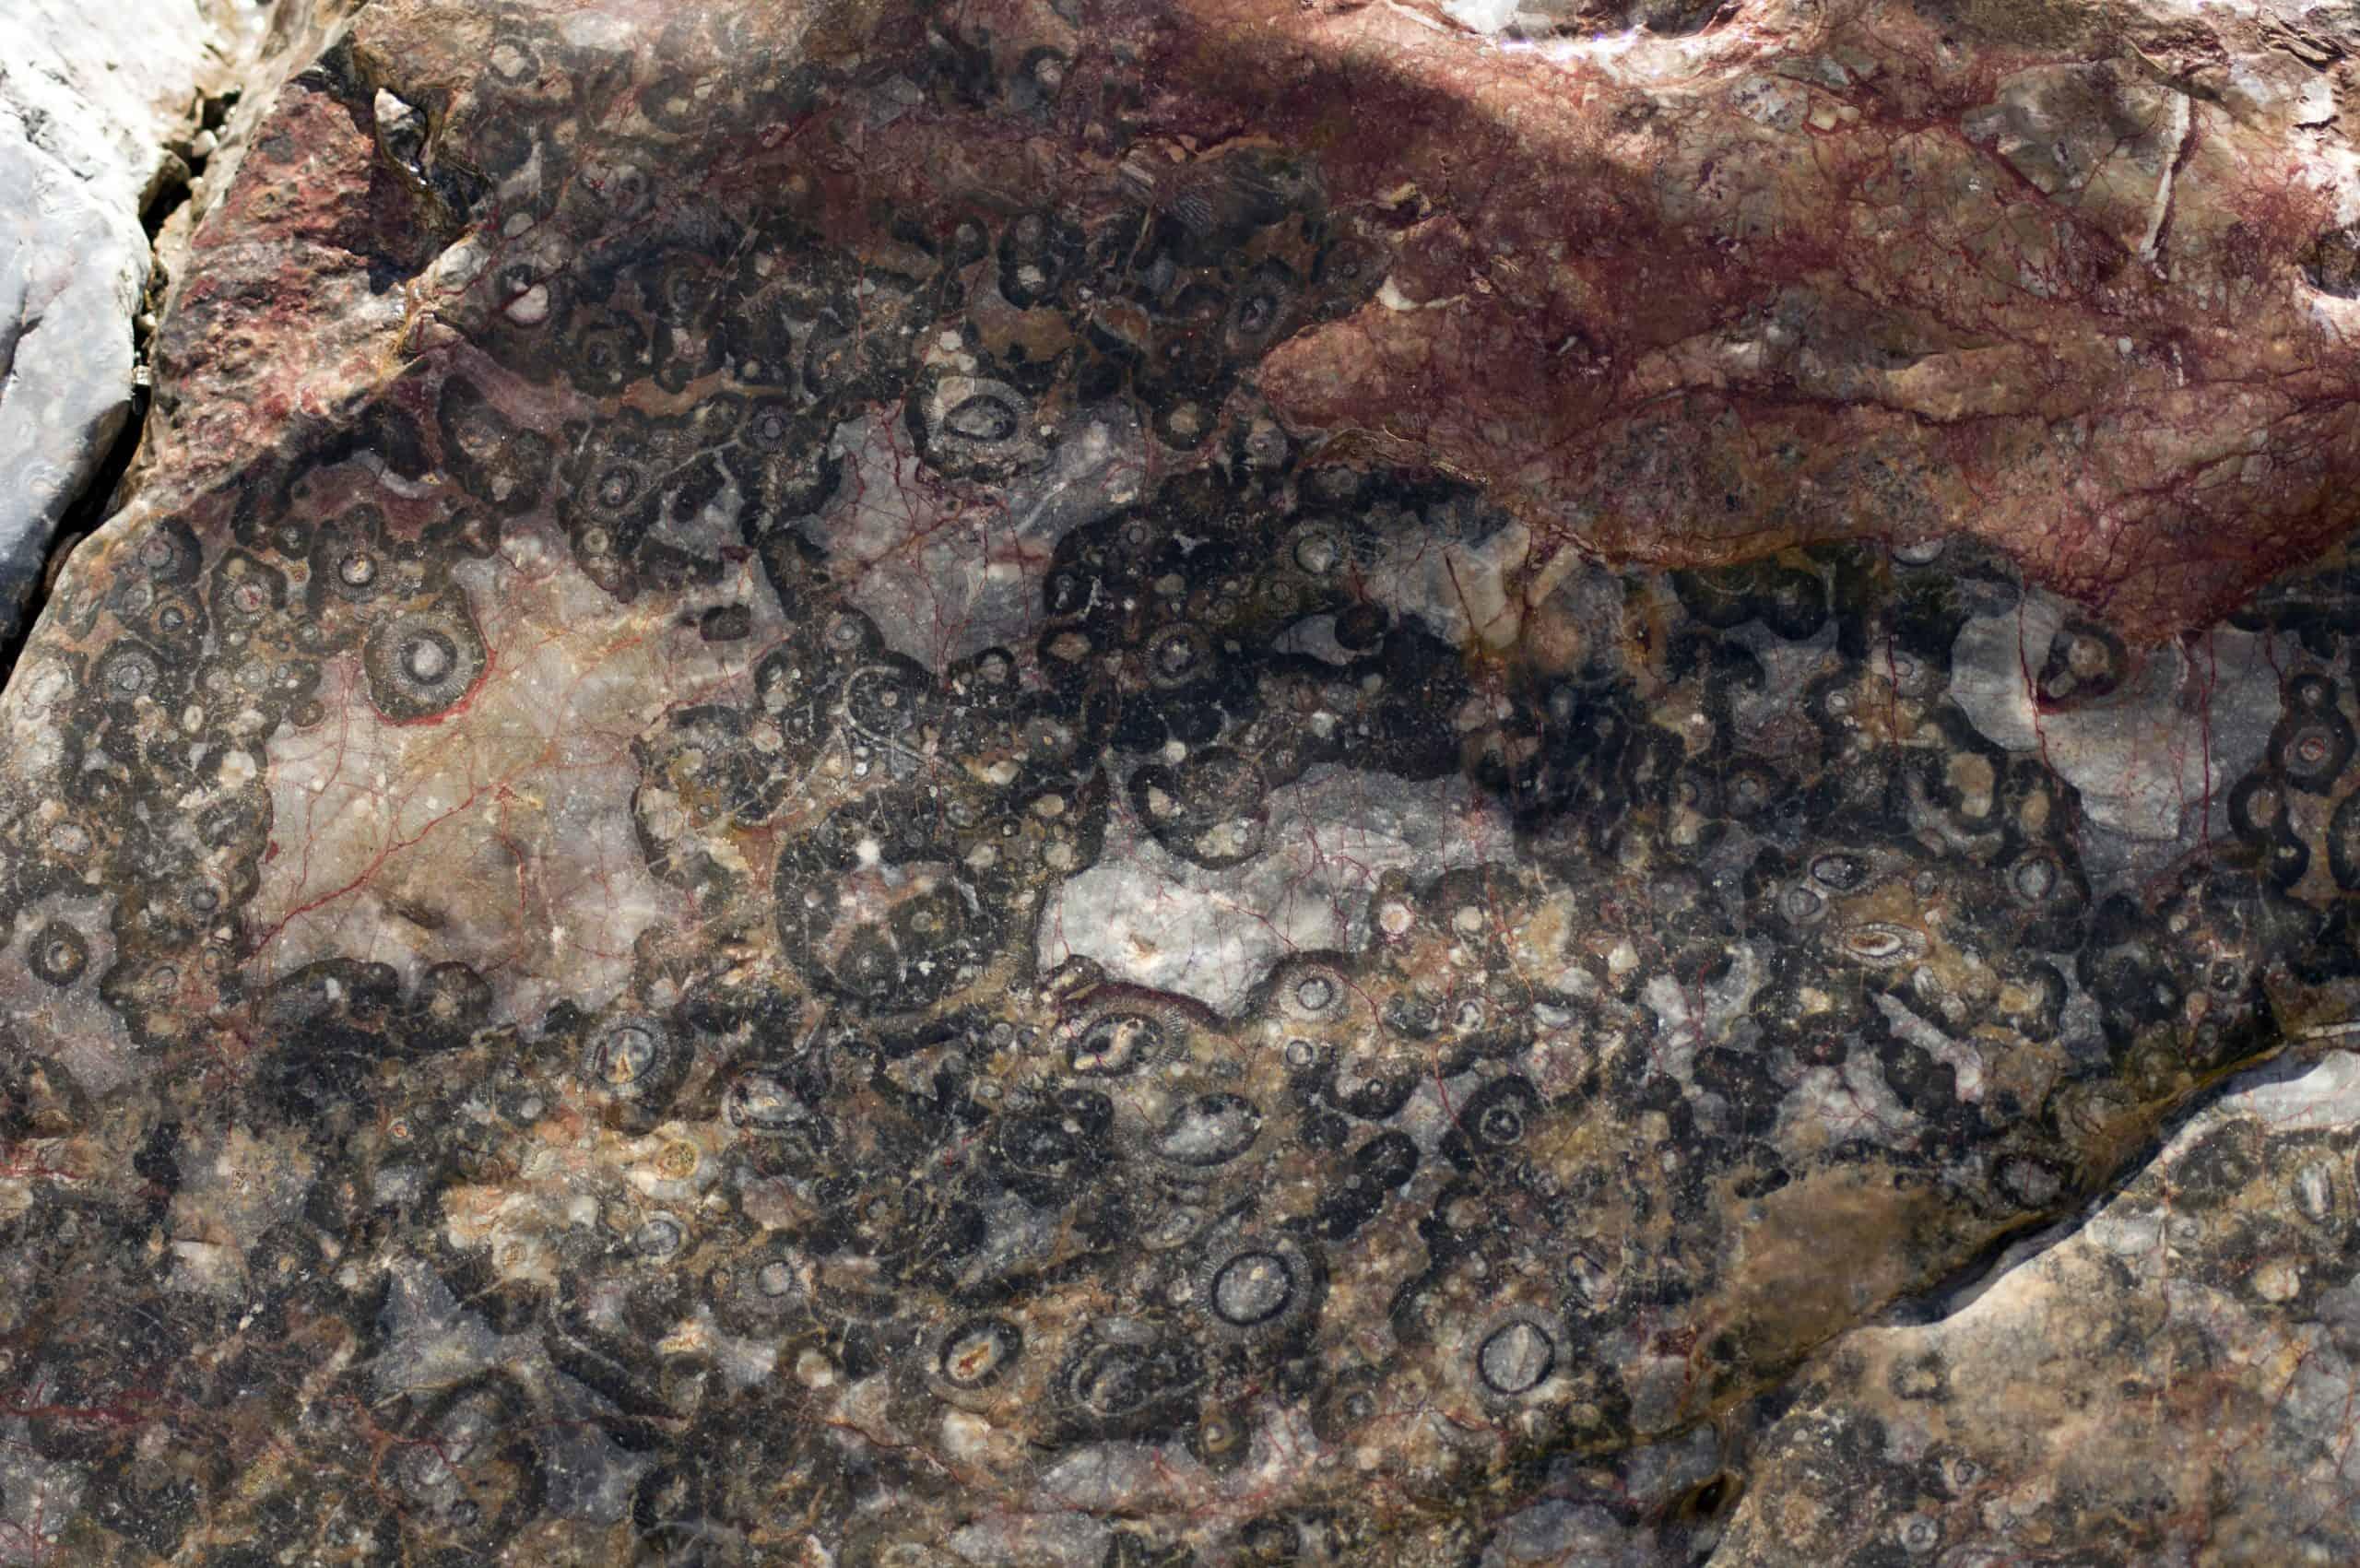 Fossils - Brachina Gorge